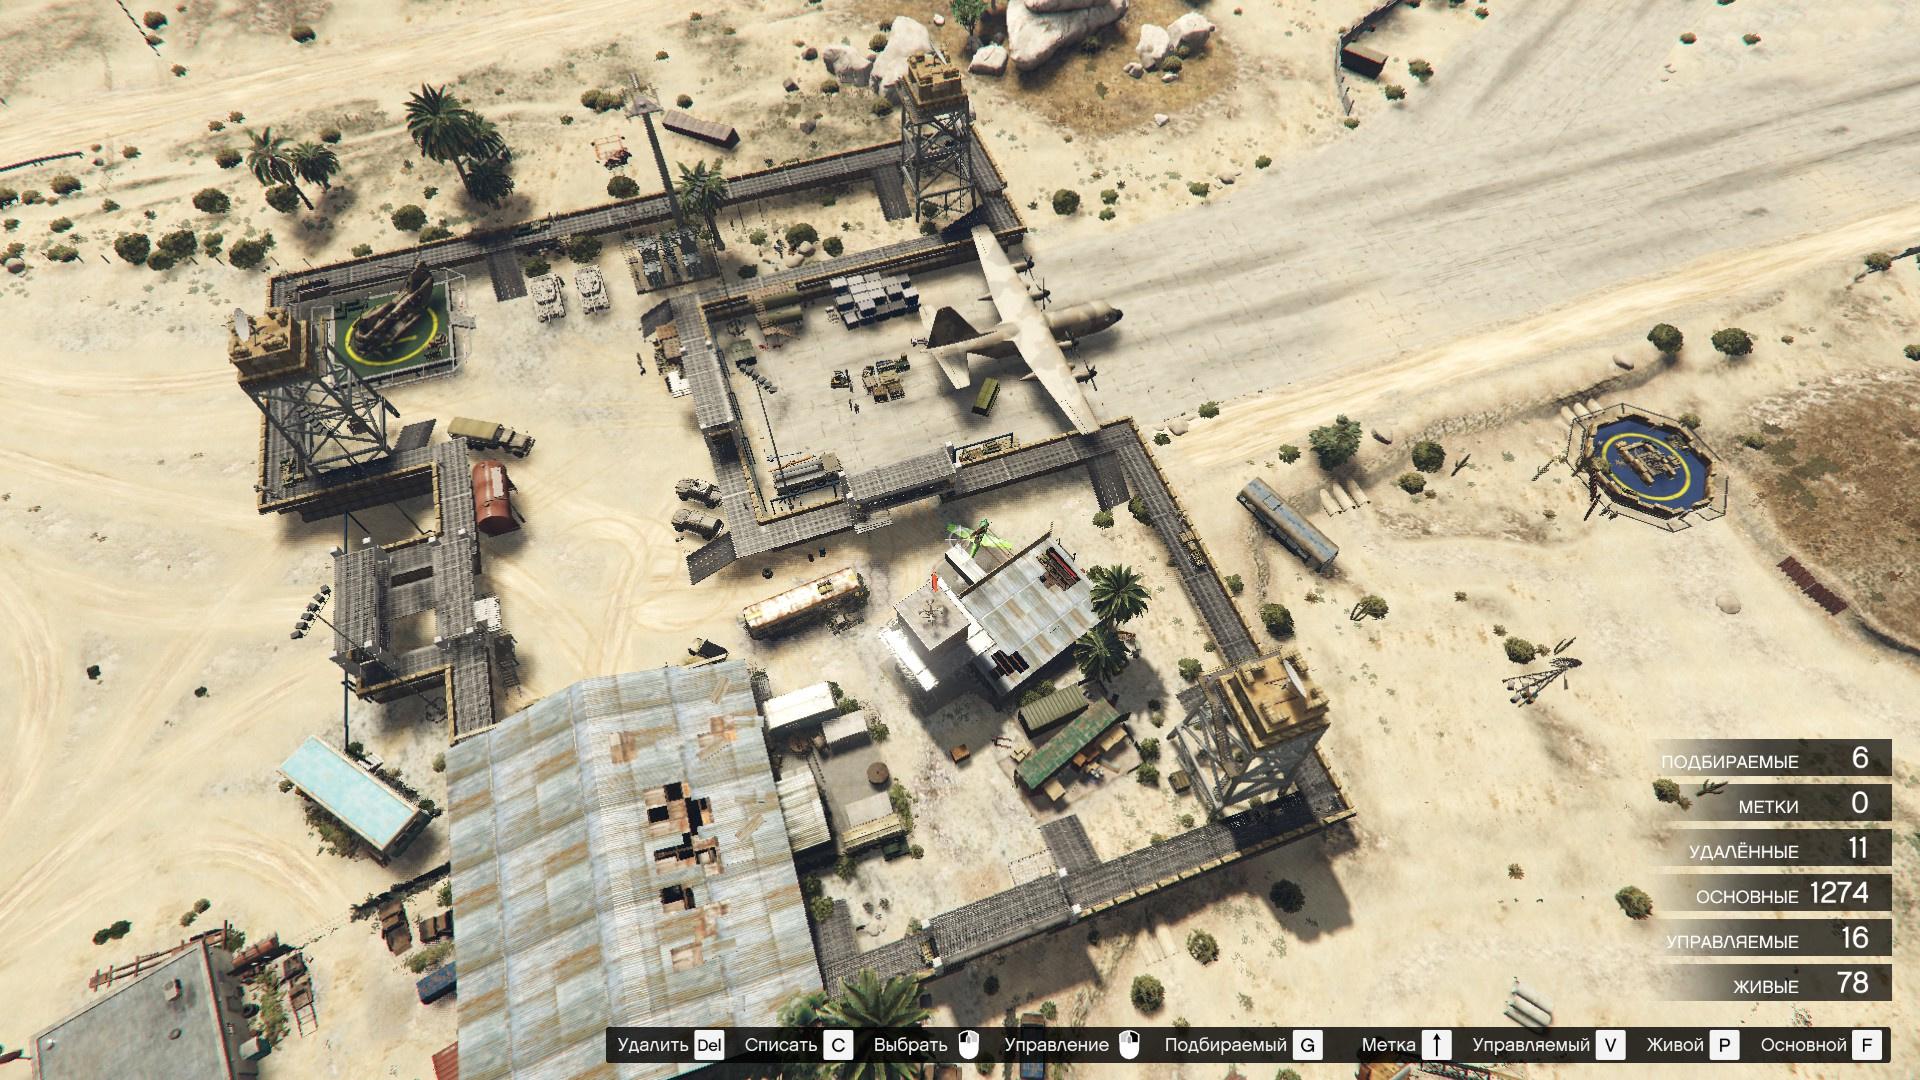 Military Base [Zombie base] (Map Editor) - GTA5-Mods.com on